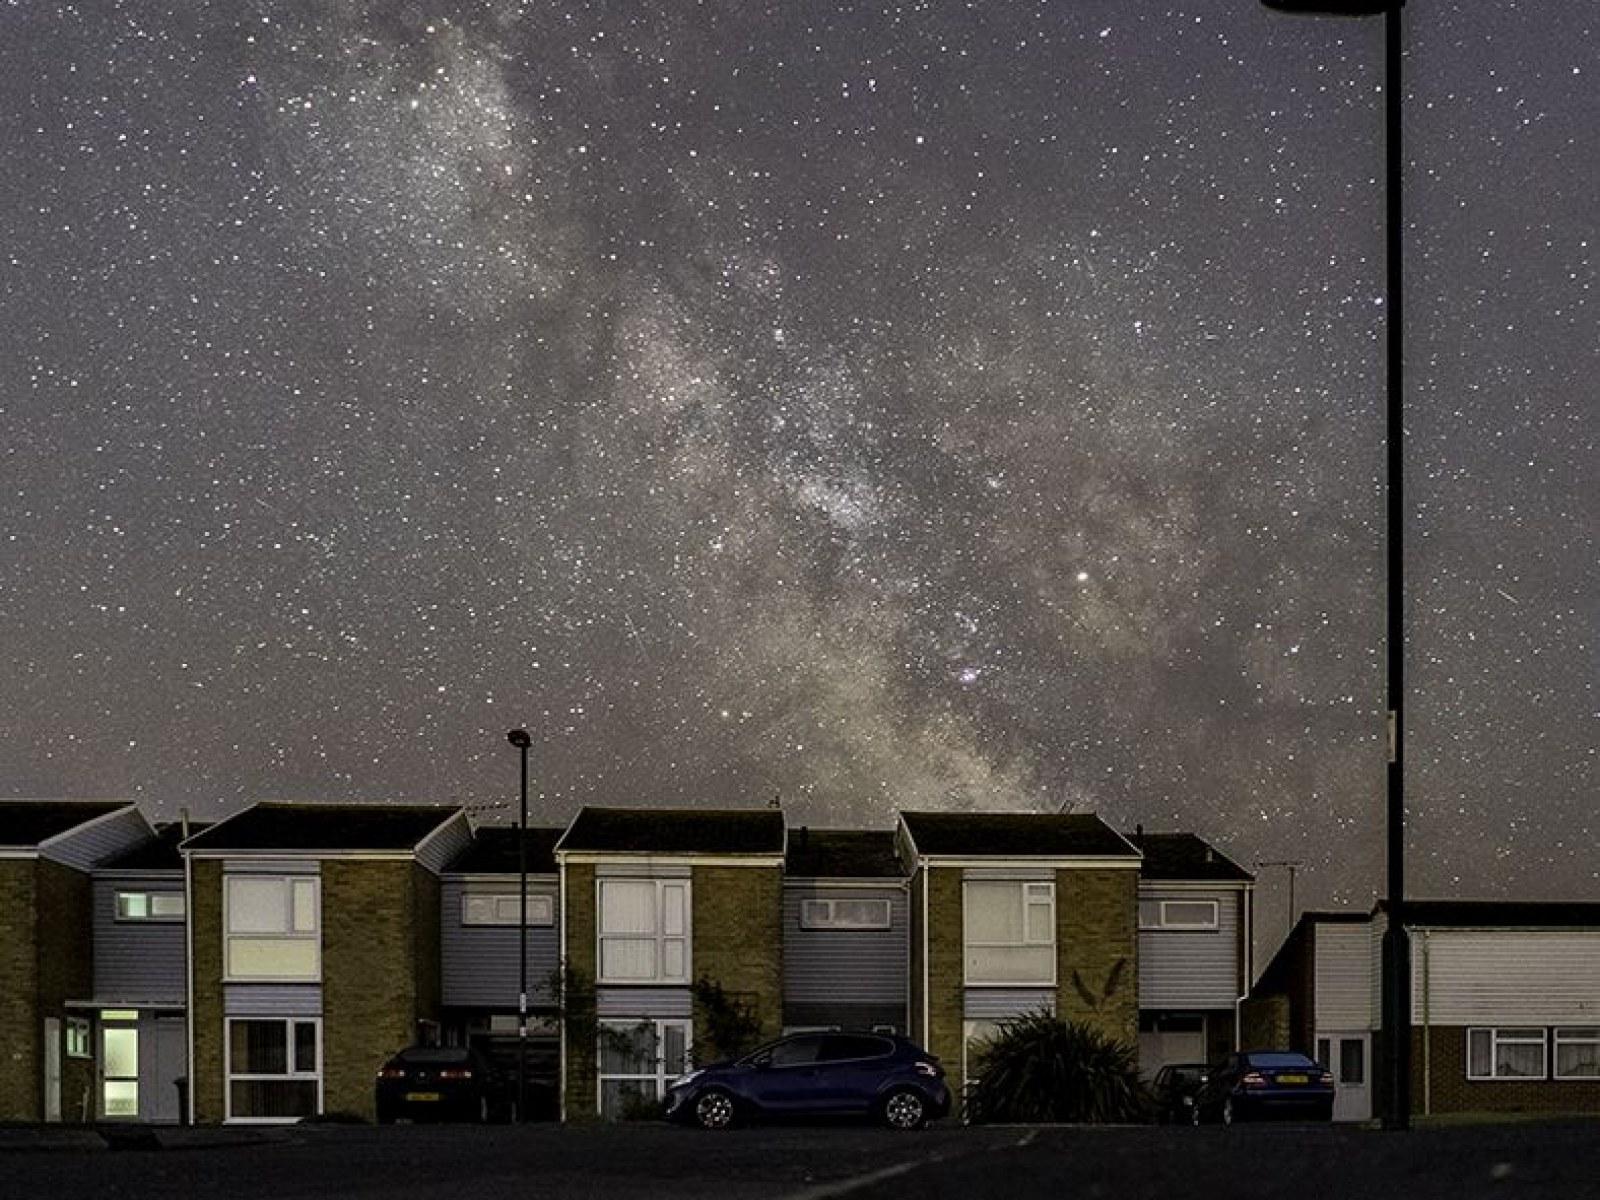 804167824c7b Stunning Utah Canyon Image Wins 2018 Astronomy Photographer of the ...